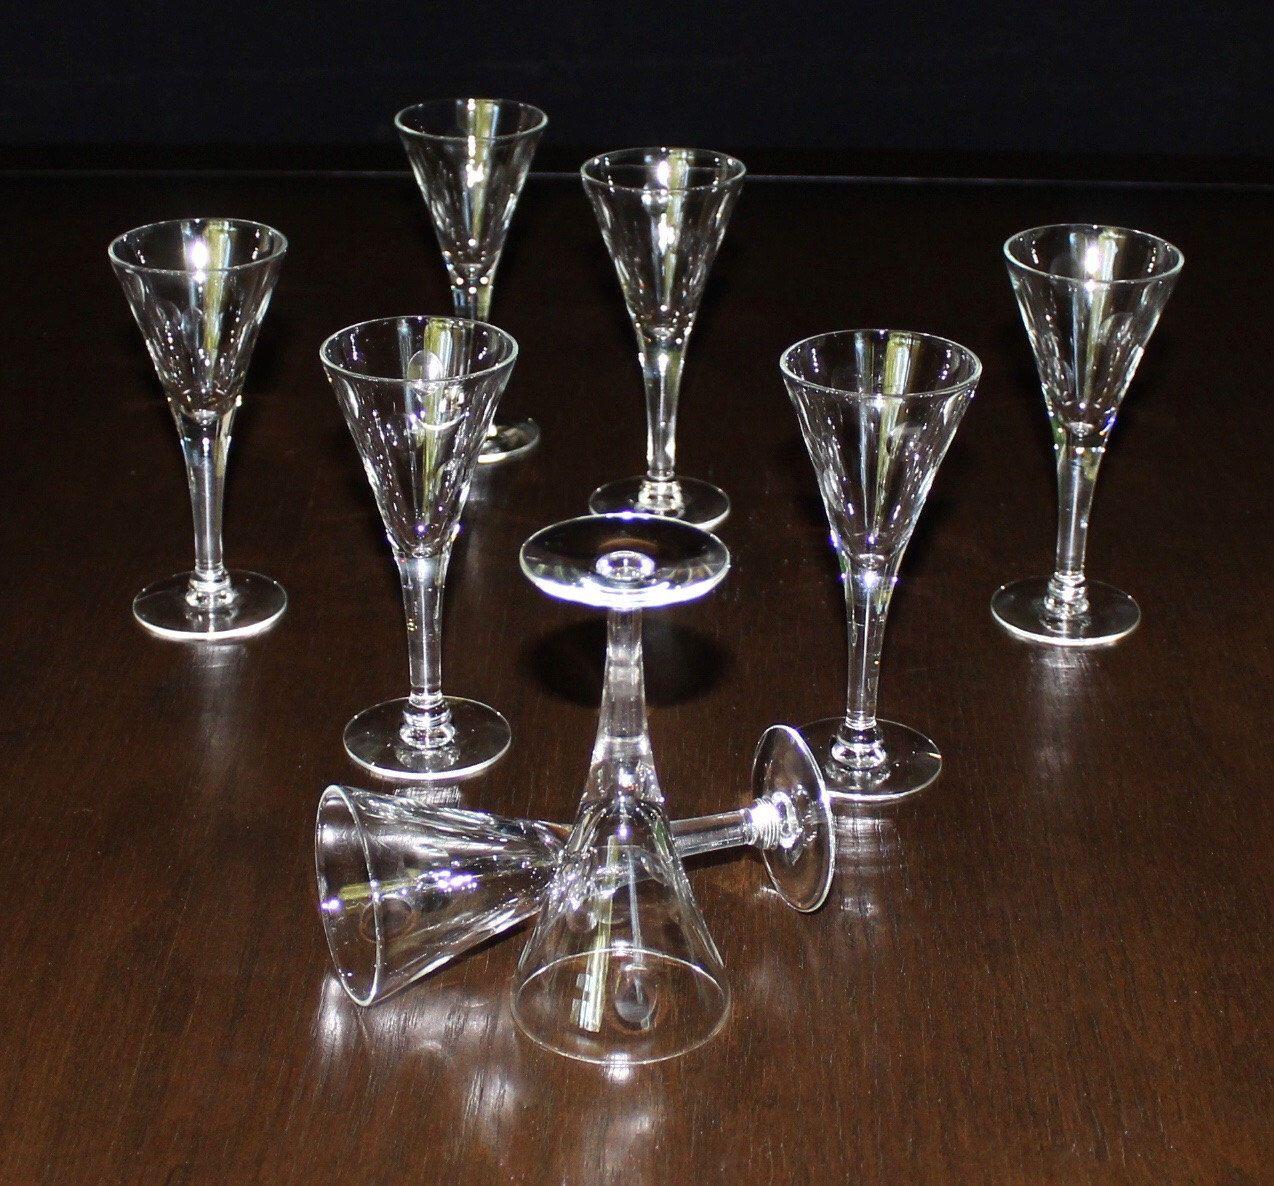 Vintage, Set of 6, Oval, Dot, Cordial Glasses, Atomic Liquor Glasses  https://www.etsy.com/listing/399578963/vintage-set-of-6-oval-dot-cordial